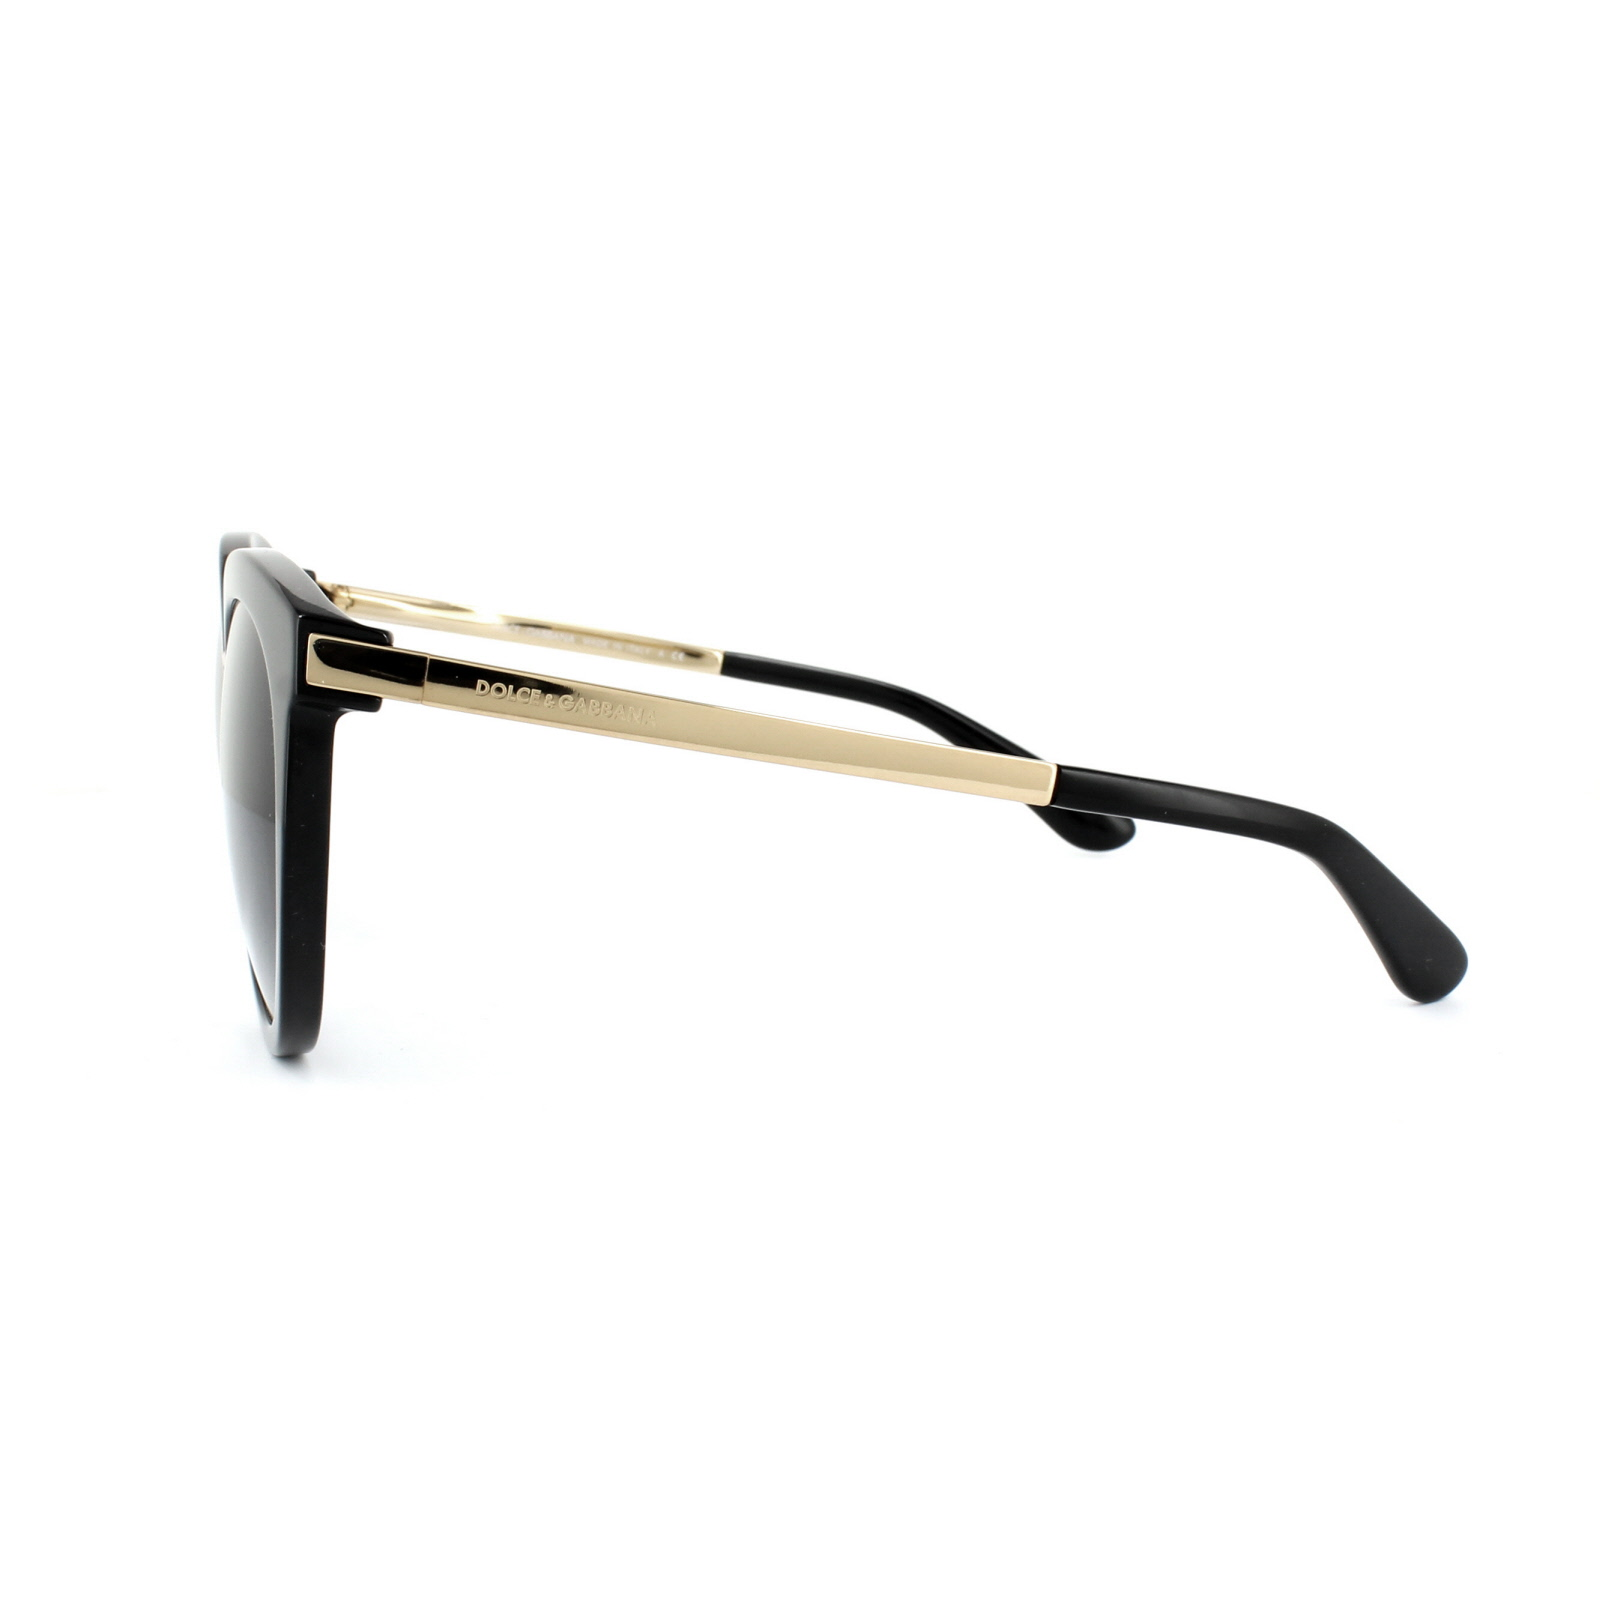 Sentinel Dolce   Gabbana Sunglasses 4268 501 8G Black Grey Gradient acc033d61d